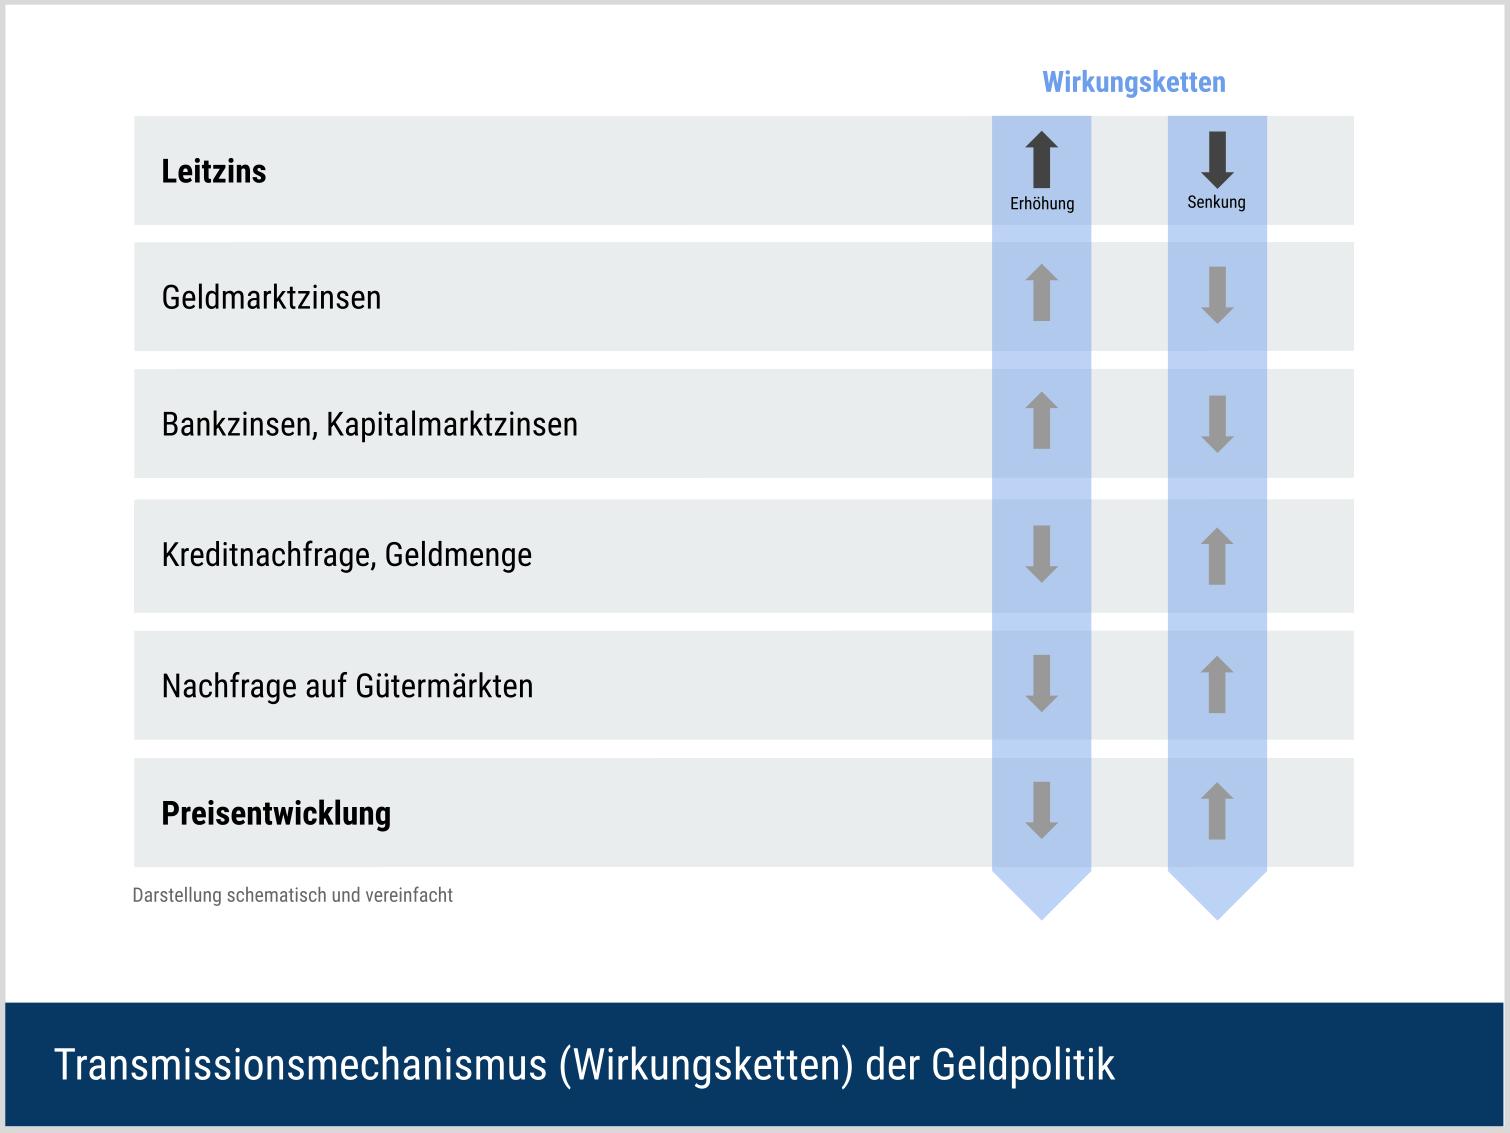 Geldpolitischer Transmissionsmechanismus der Zentralbanken